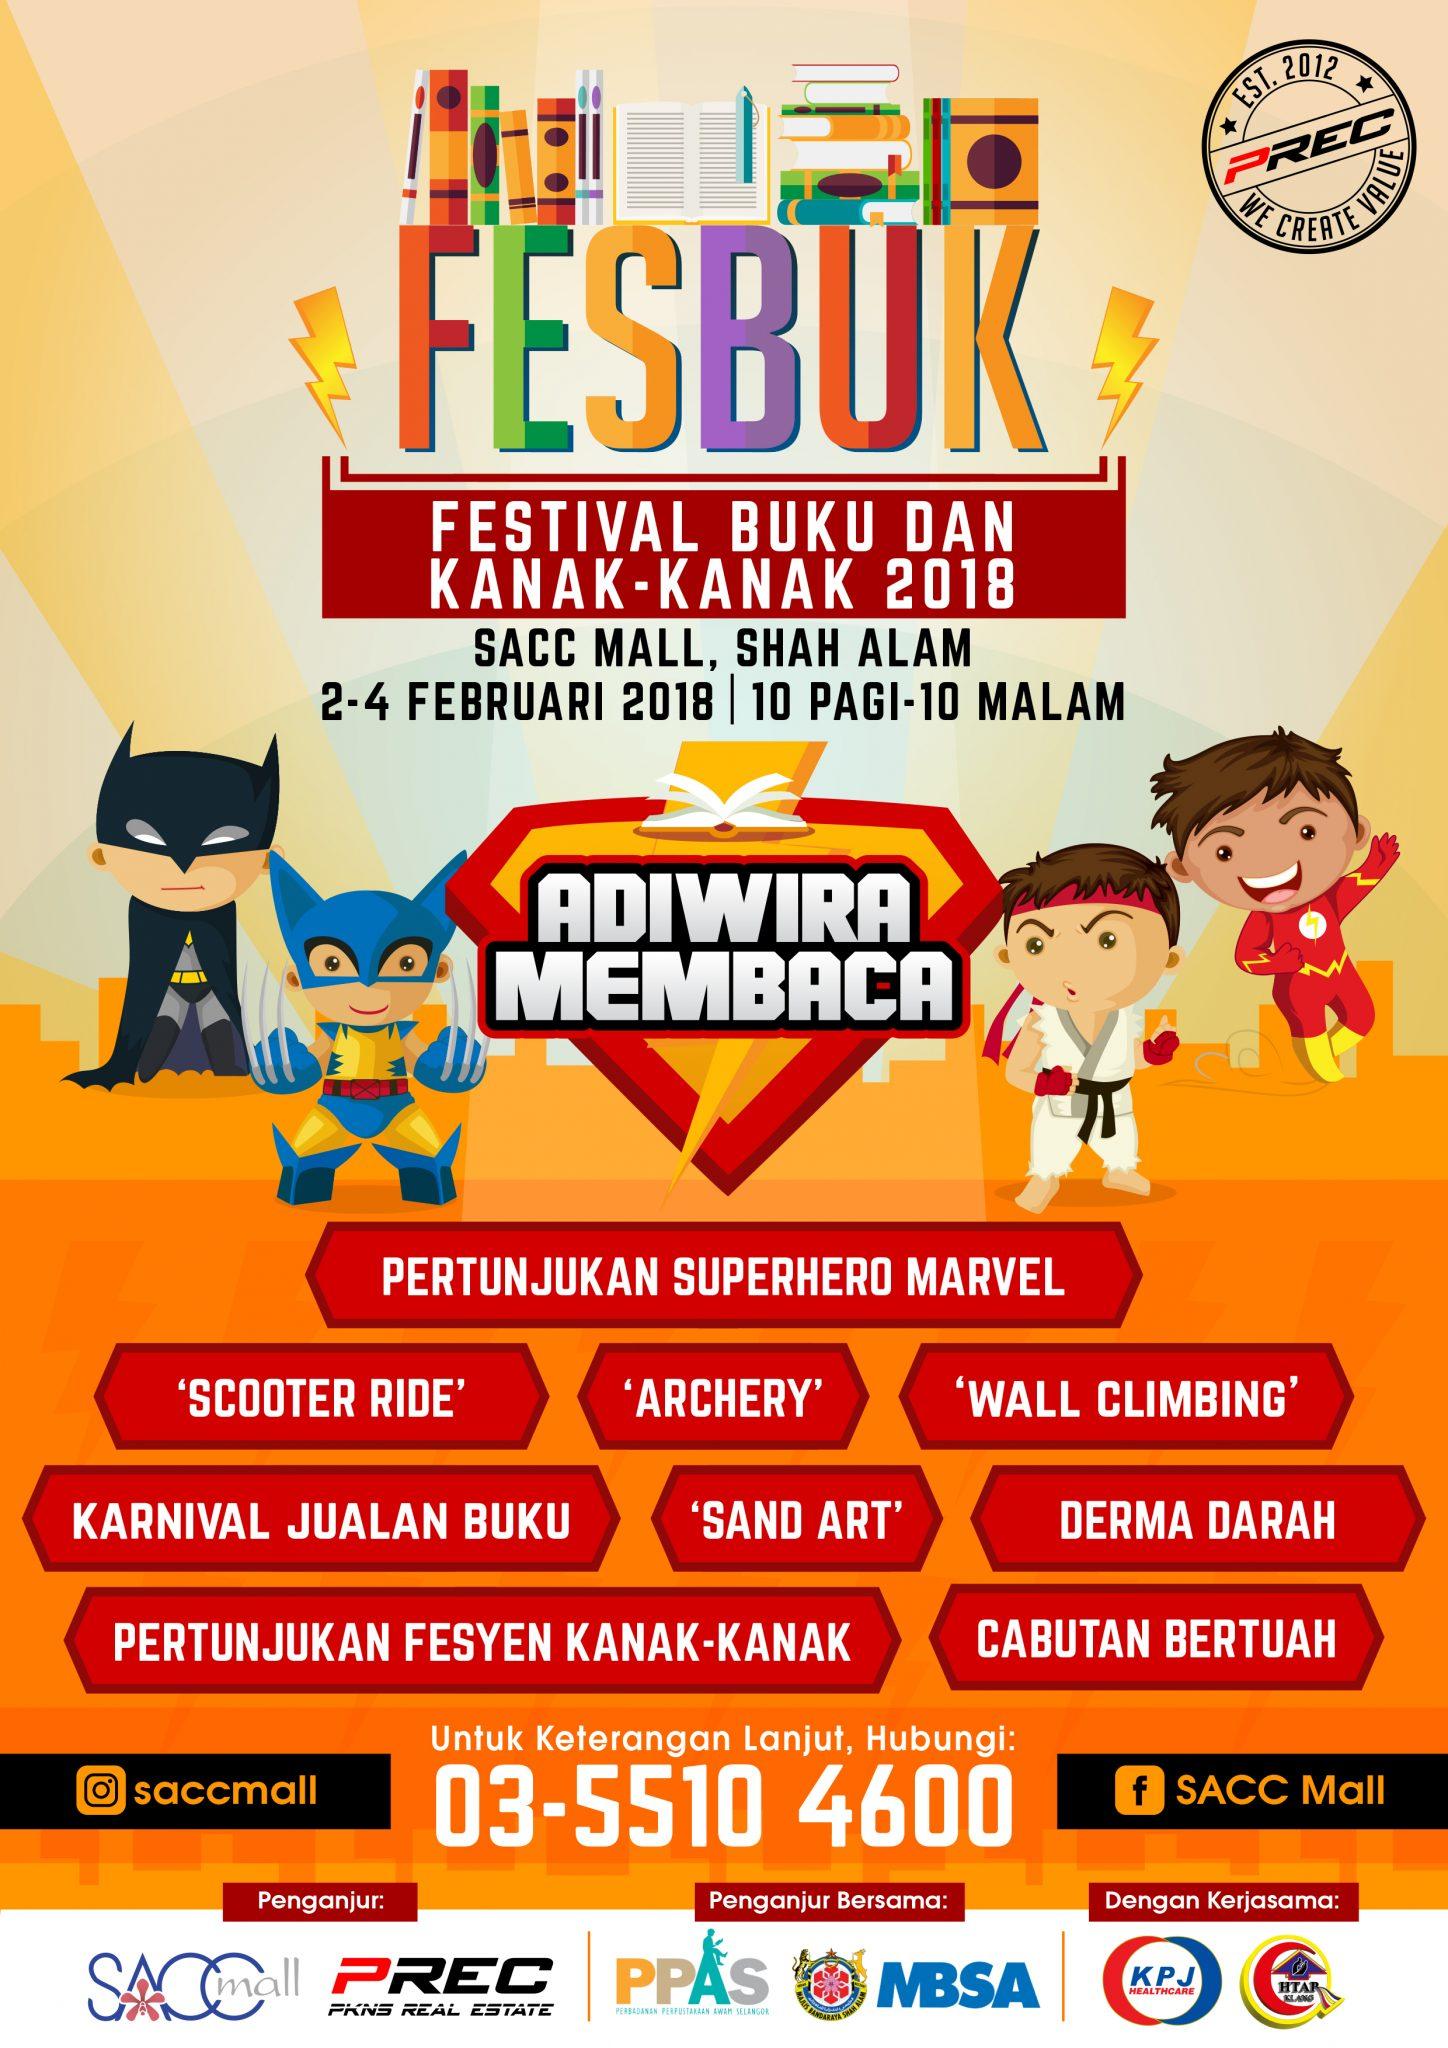 Festival Buku & Kanak-Kanak 2018 (FESBUK'18)